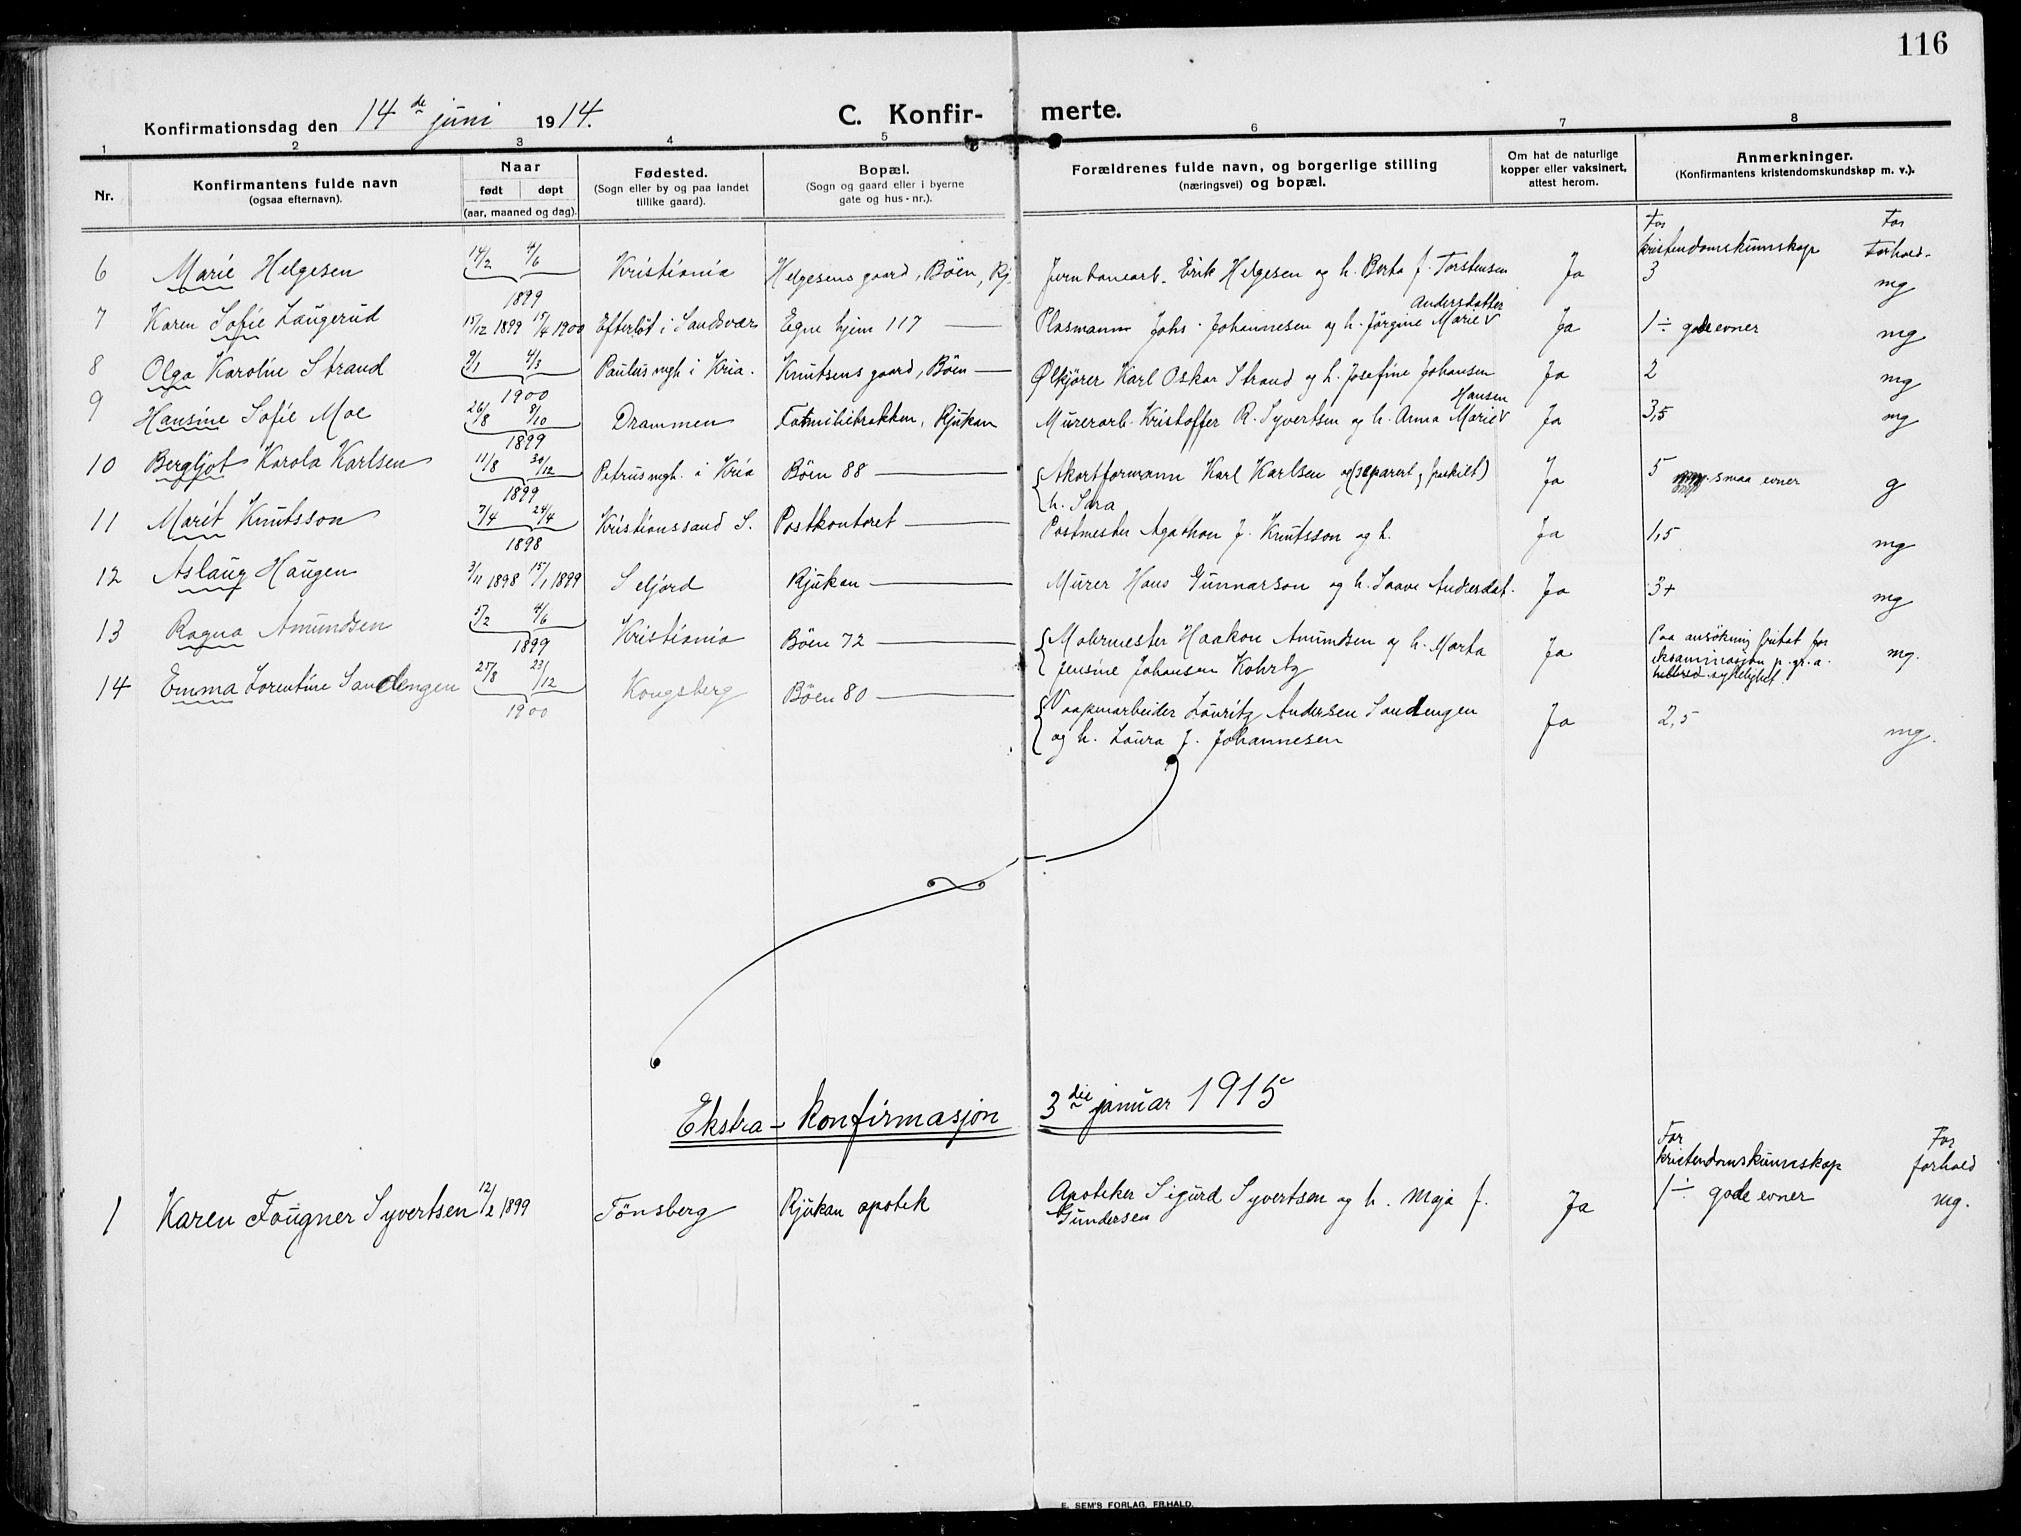 SAKO, Rjukan kirkebøker, F/Fa/L0002: Ministerialbok nr. 2, 1912-1917, s. 116